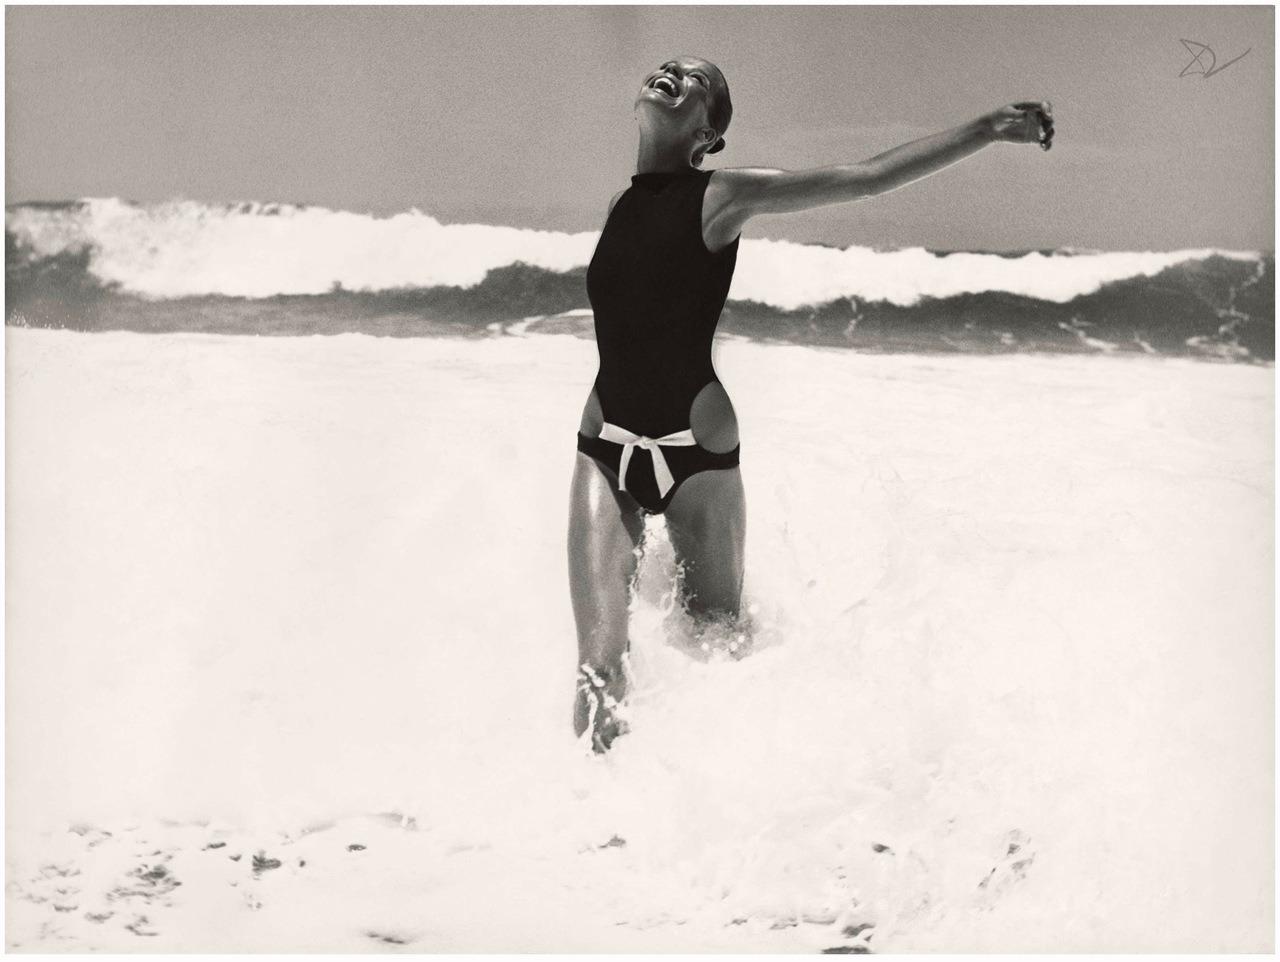 Veruschka photographed by Franco Rubartelli for Vogue,15 January, 1968. #veruschka#franco rubartelli#vogue#fashion#editorial#1960s#60s